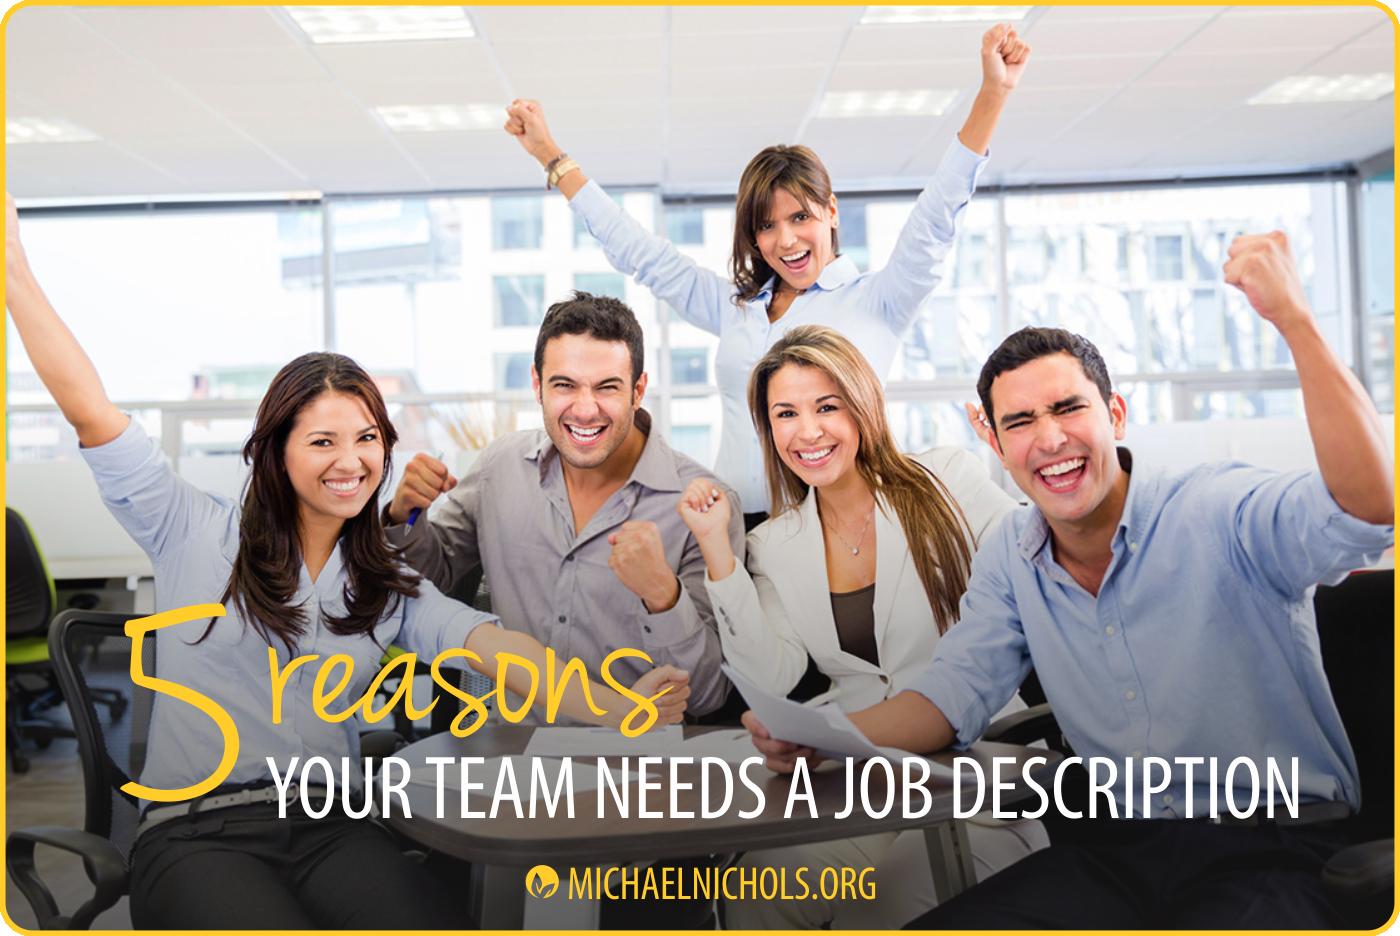 5effc64e031 Job Description - 5 Reasons Your Team Needs It